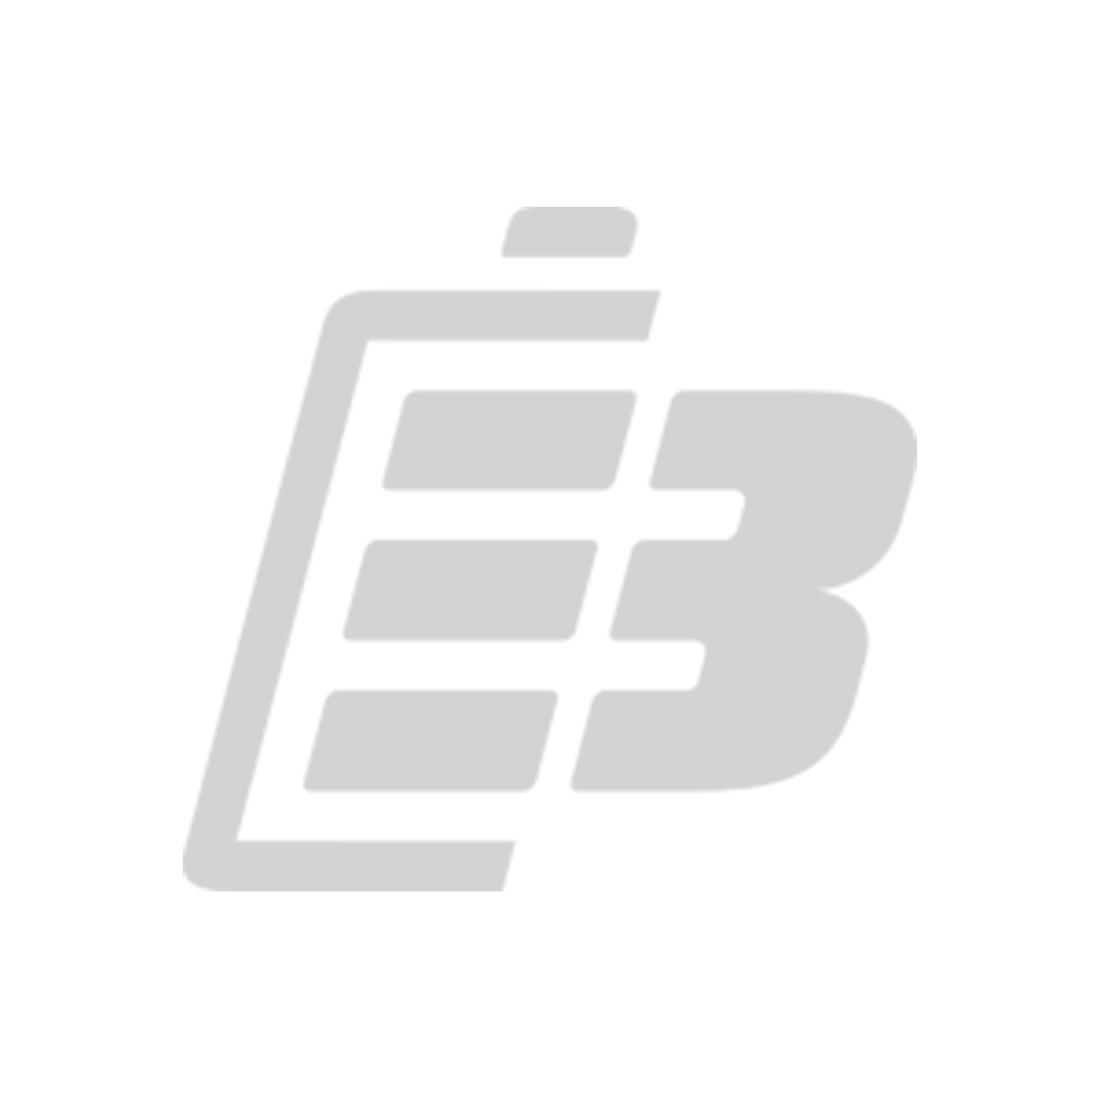 MPD Battery Holder 6_AAFL